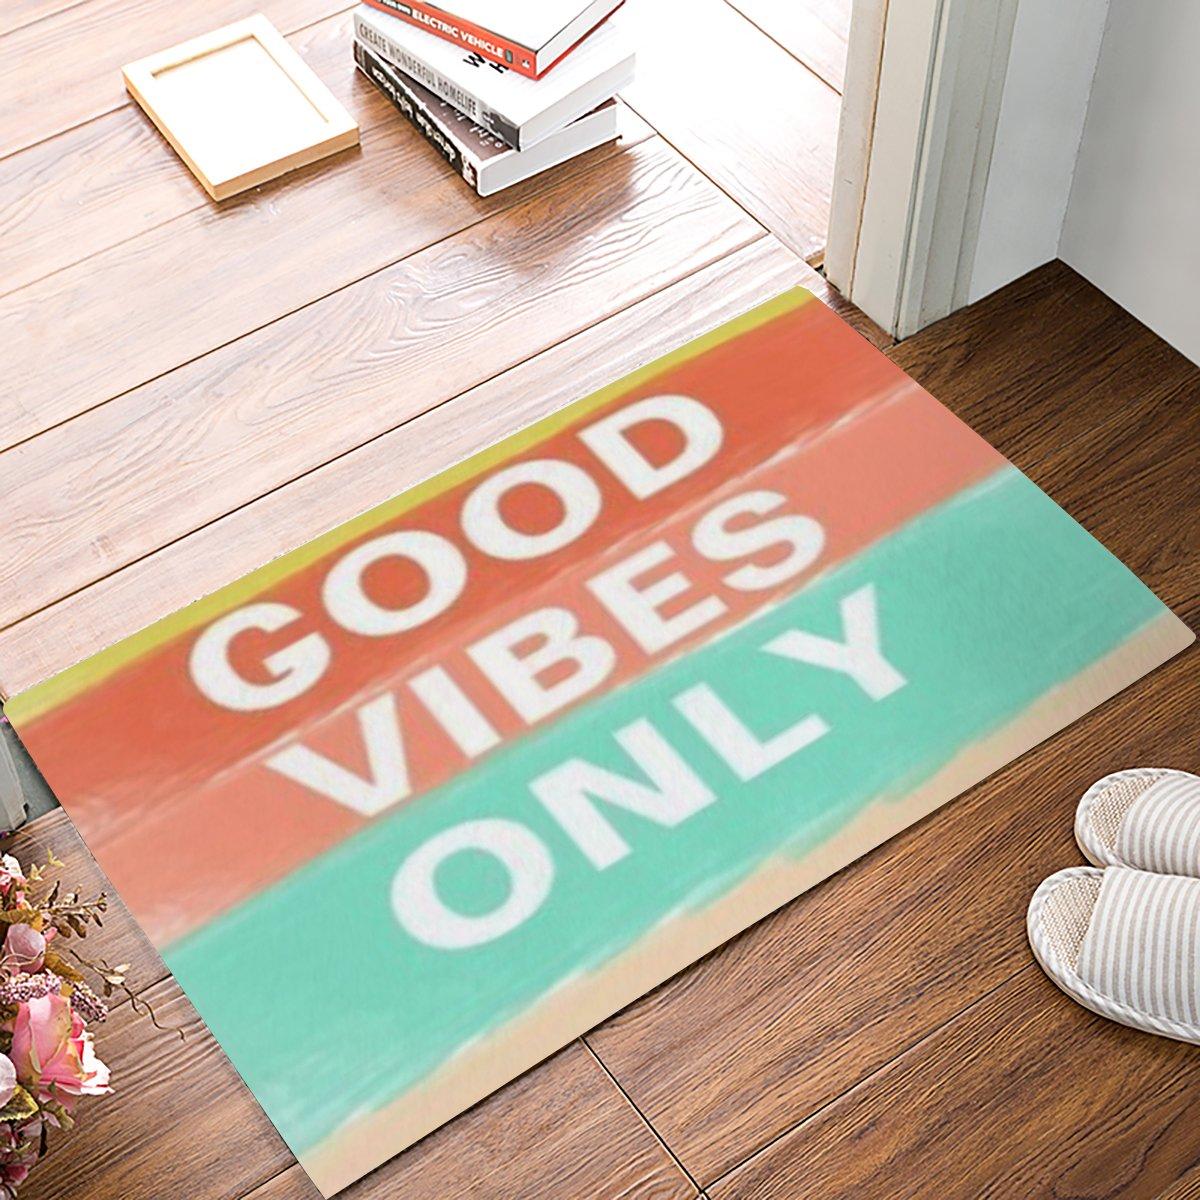 "CHARMHOME Good Vibes Only Custom Doormat Door Mat Machine Washable Rug Non Slip Mats Bathroom Kitchen Decor Area Rug(31.5"" X 20"",L X W)"